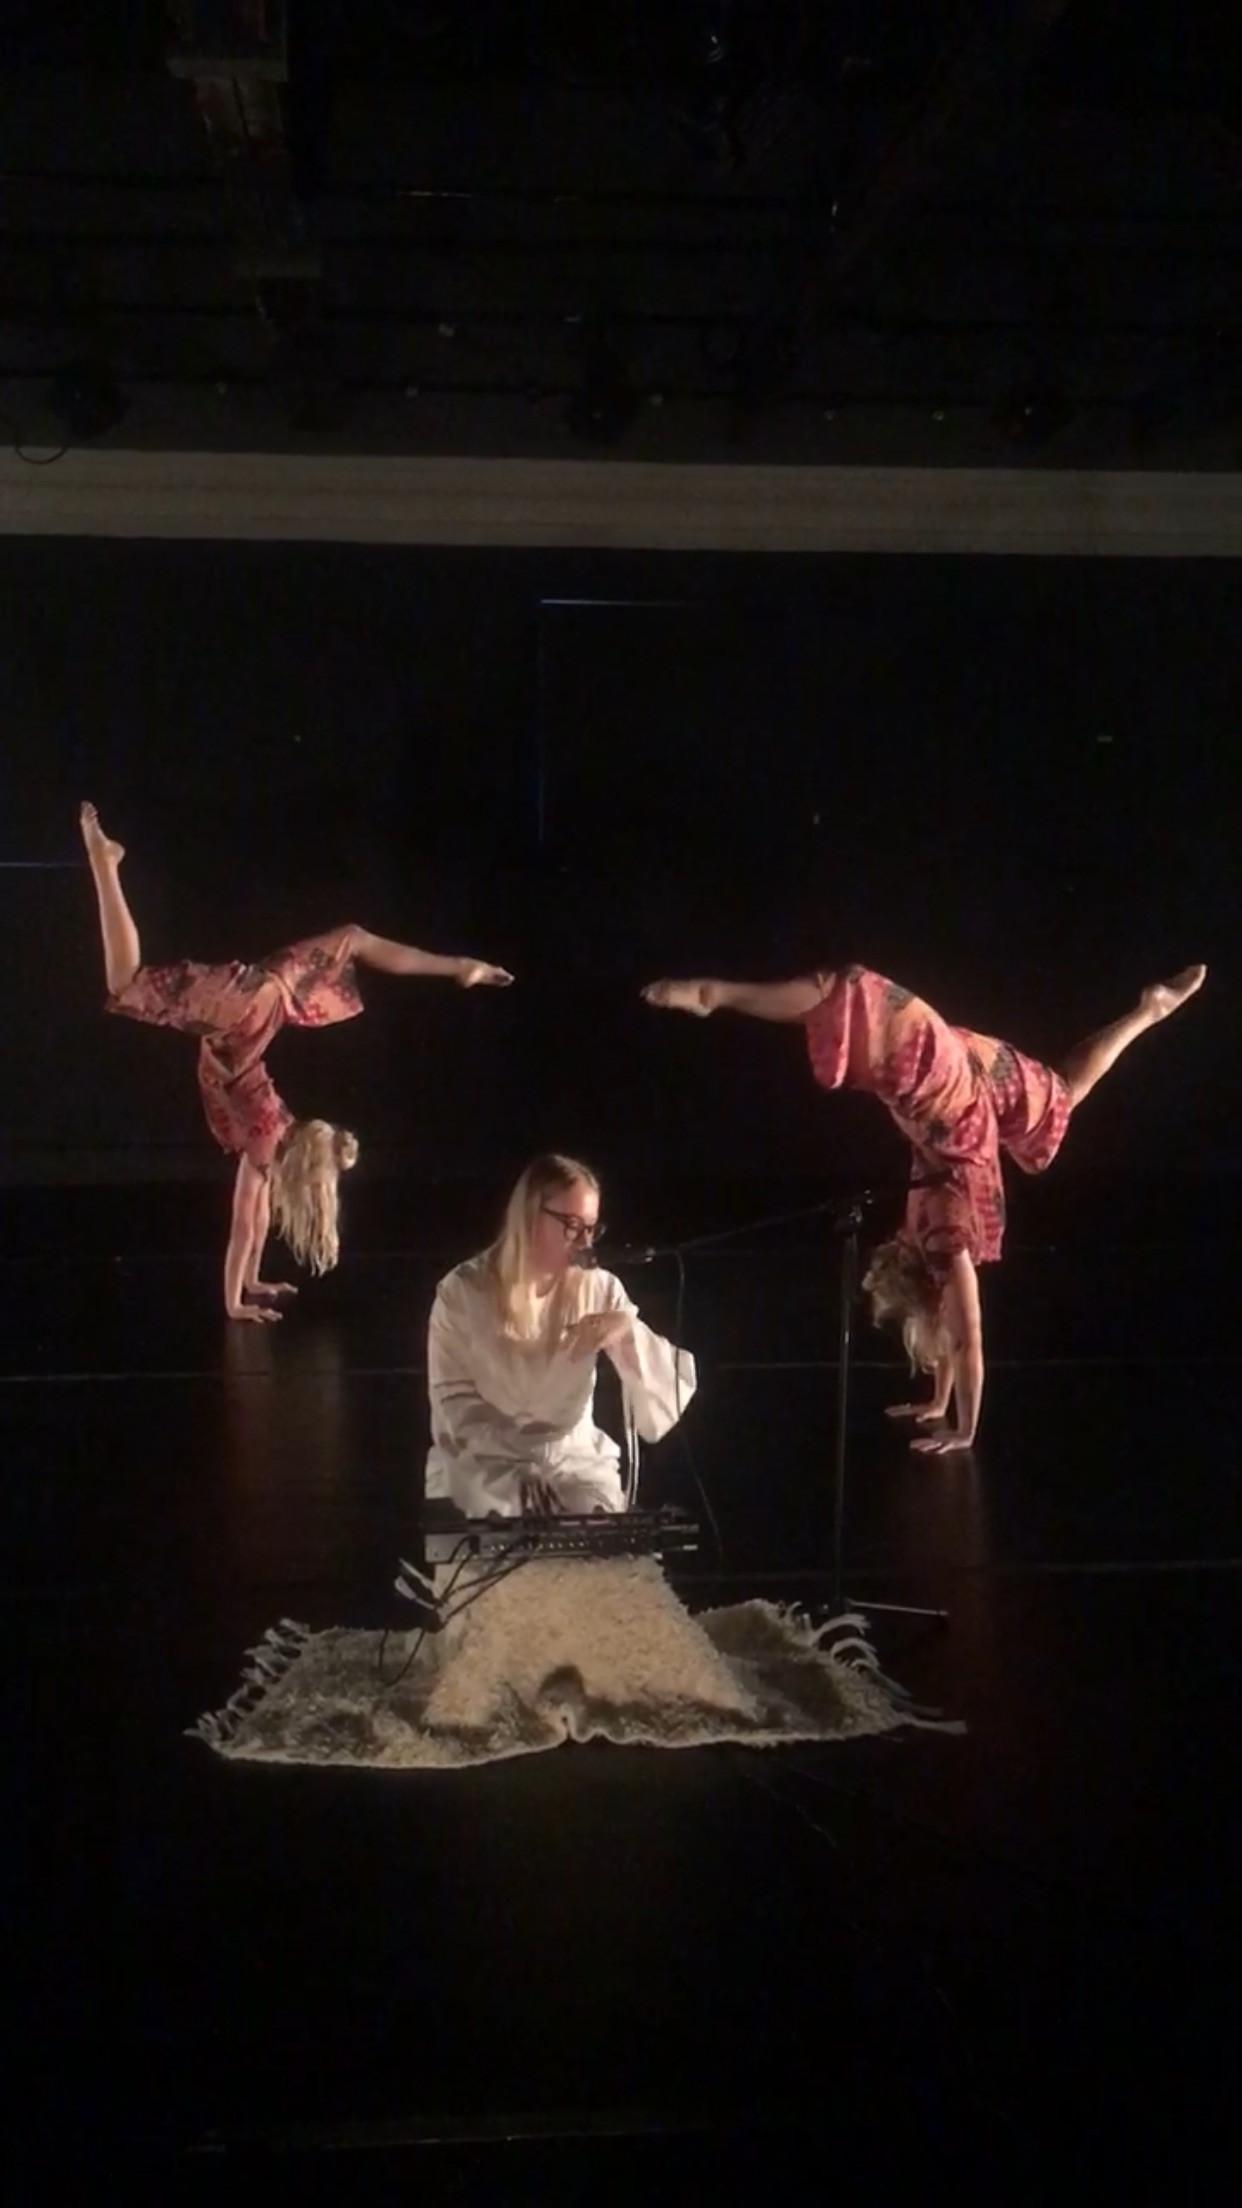 O R L A live performance!